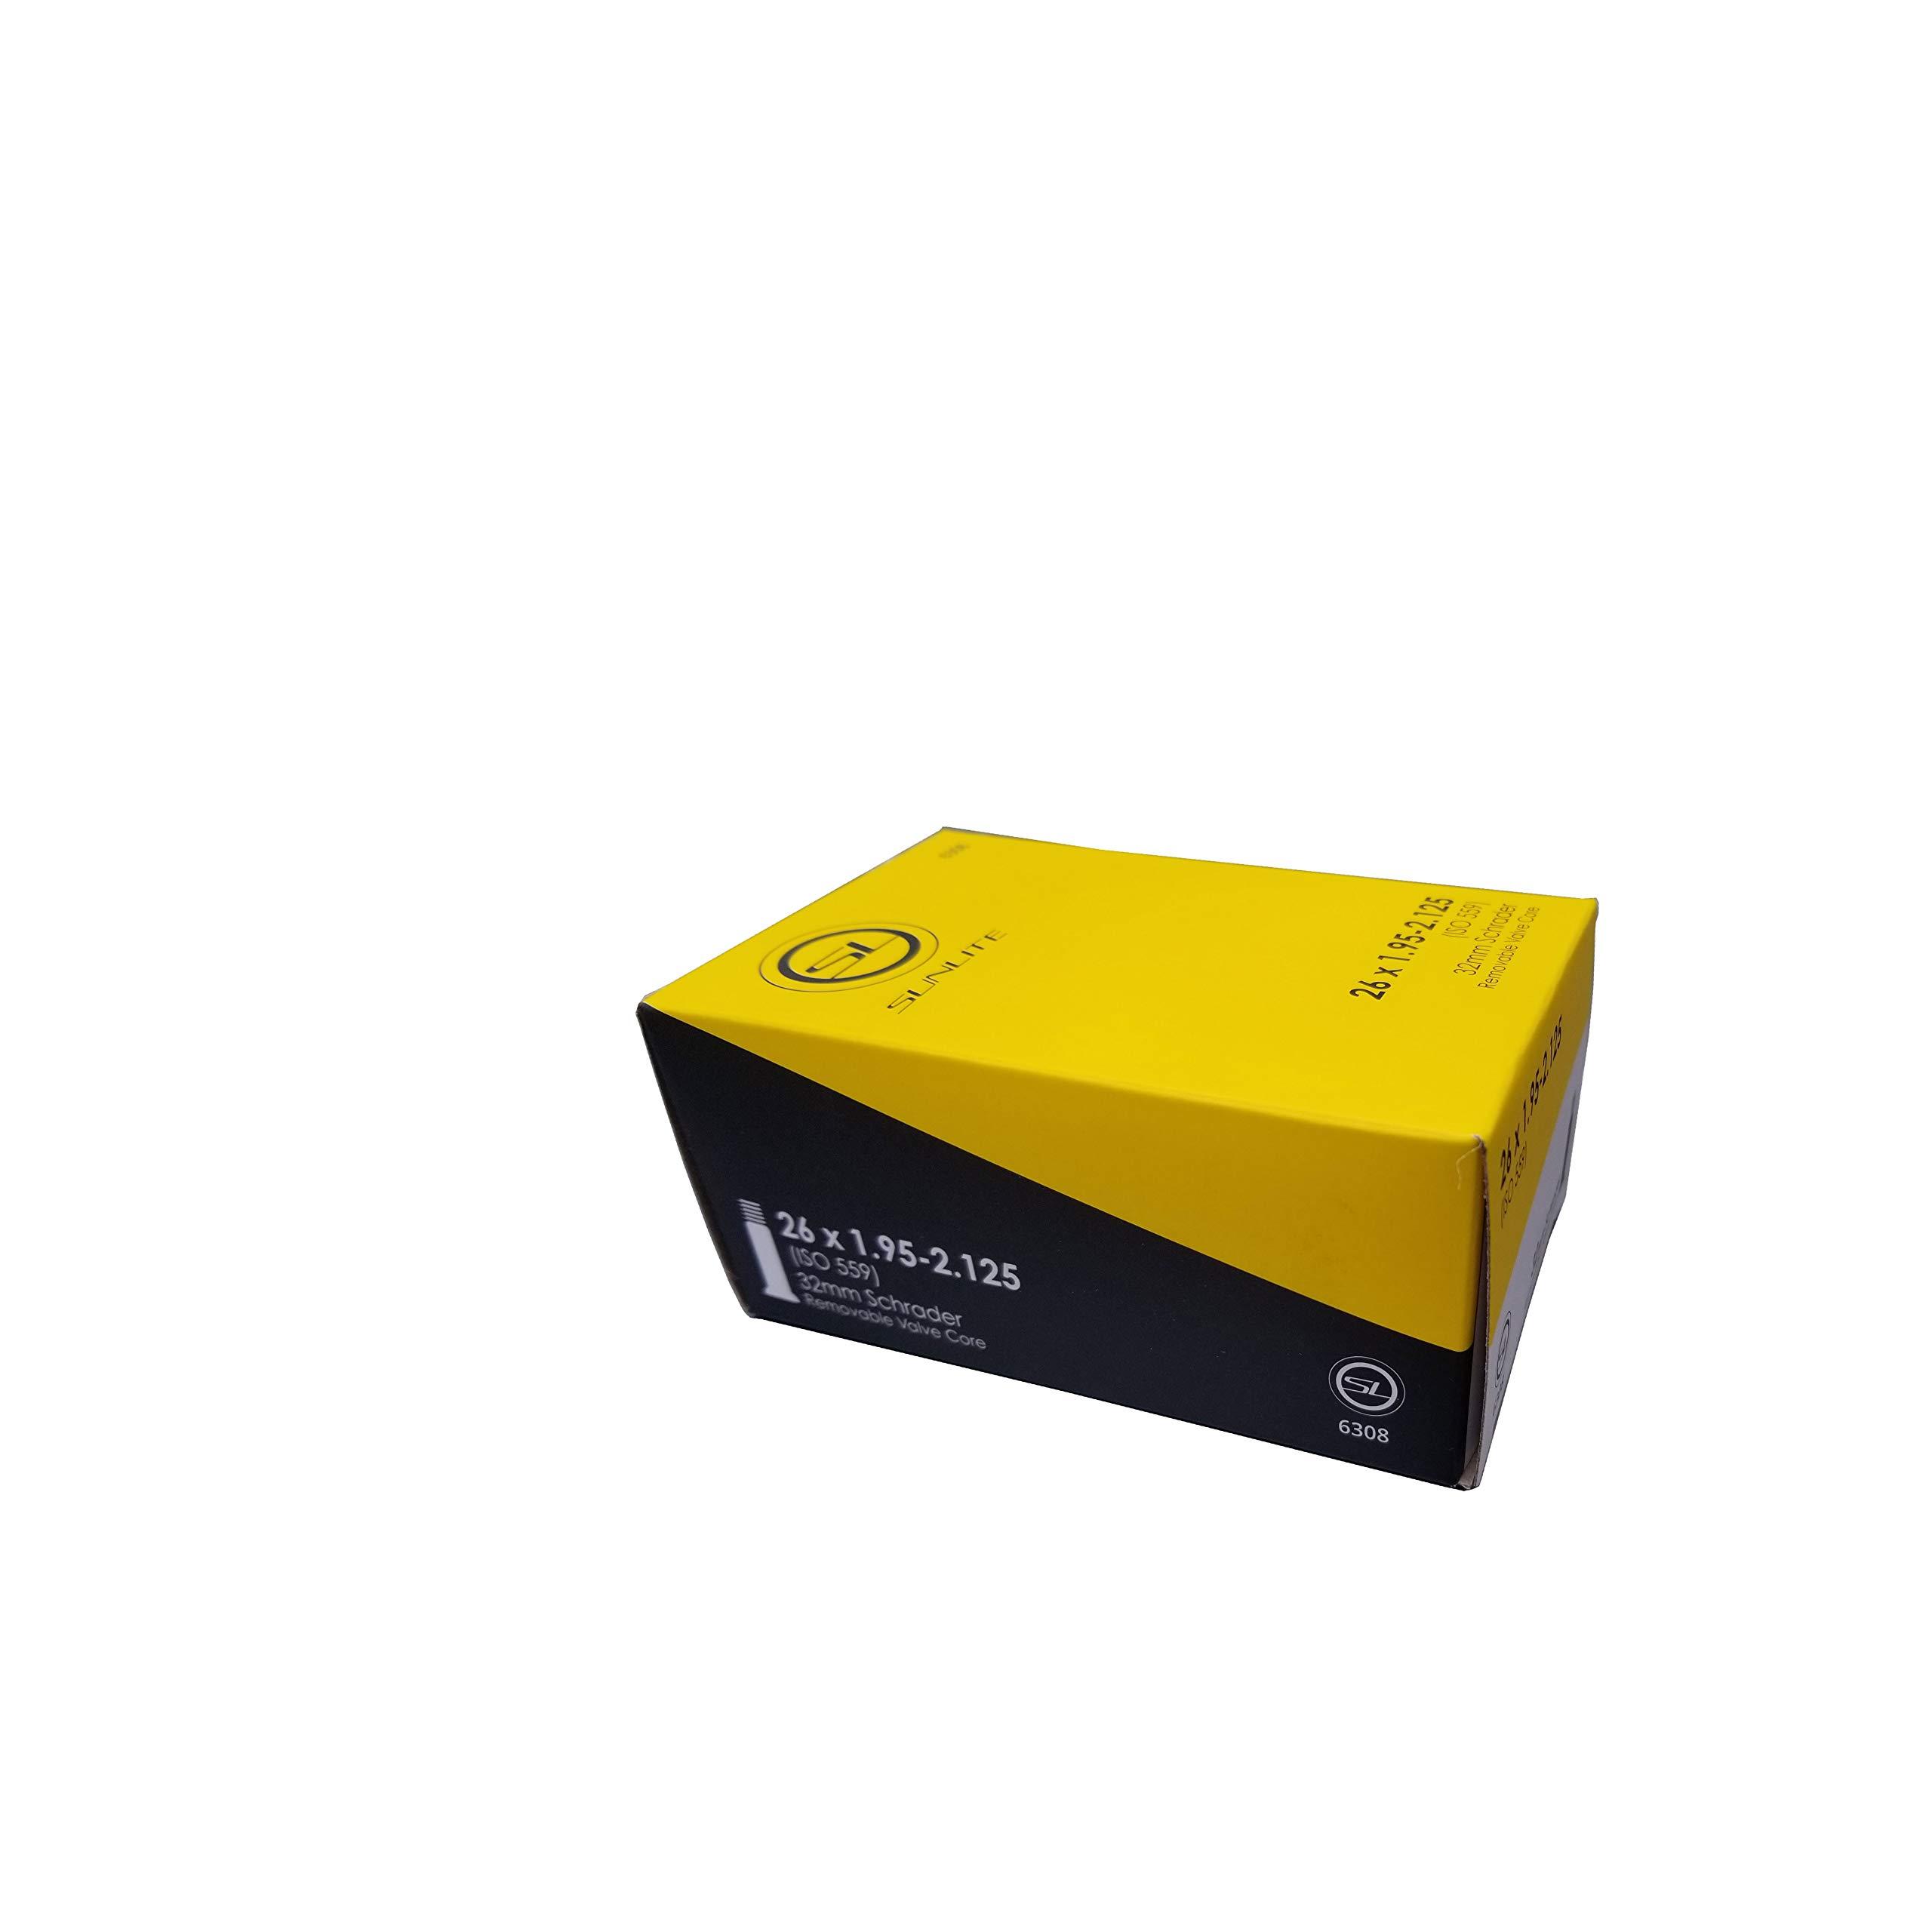 Street Fit 360 Tube, 26 x 1.95-2.125 32mm Schrader Valve by Street Fit 360